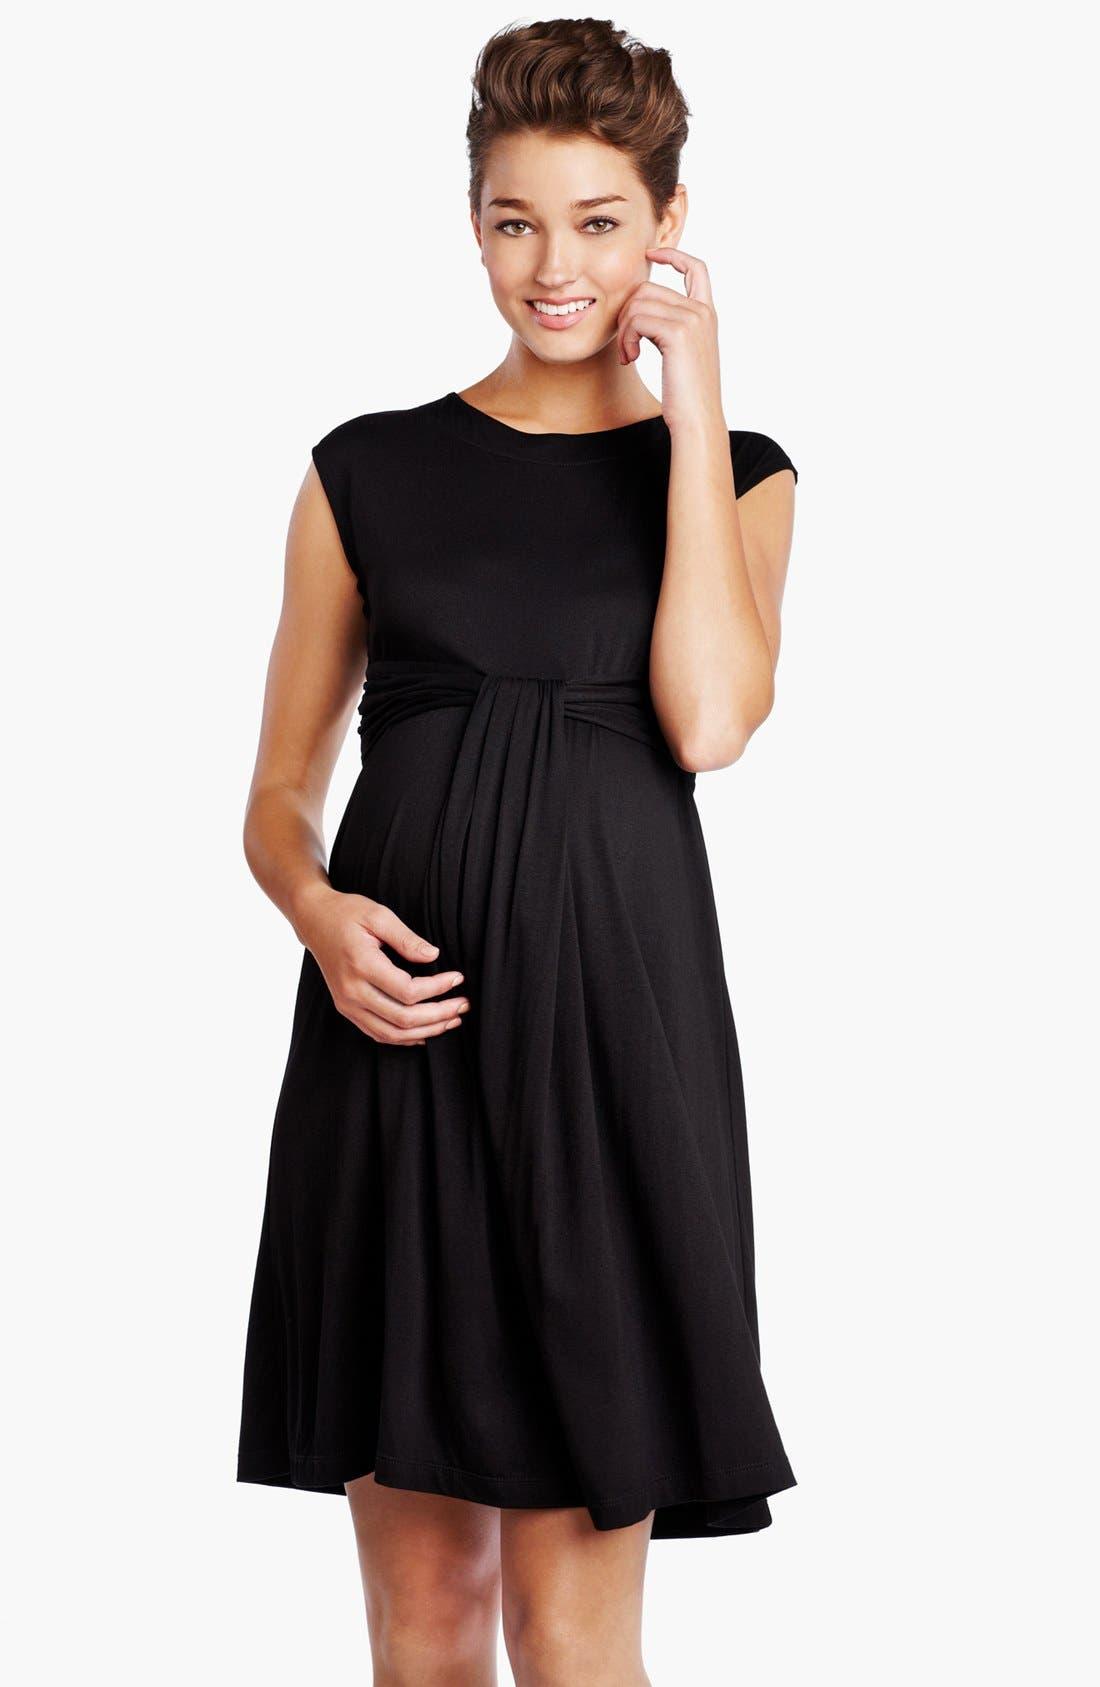 Main Image - Maternal America 'Empire Cascade' Maternity Dress